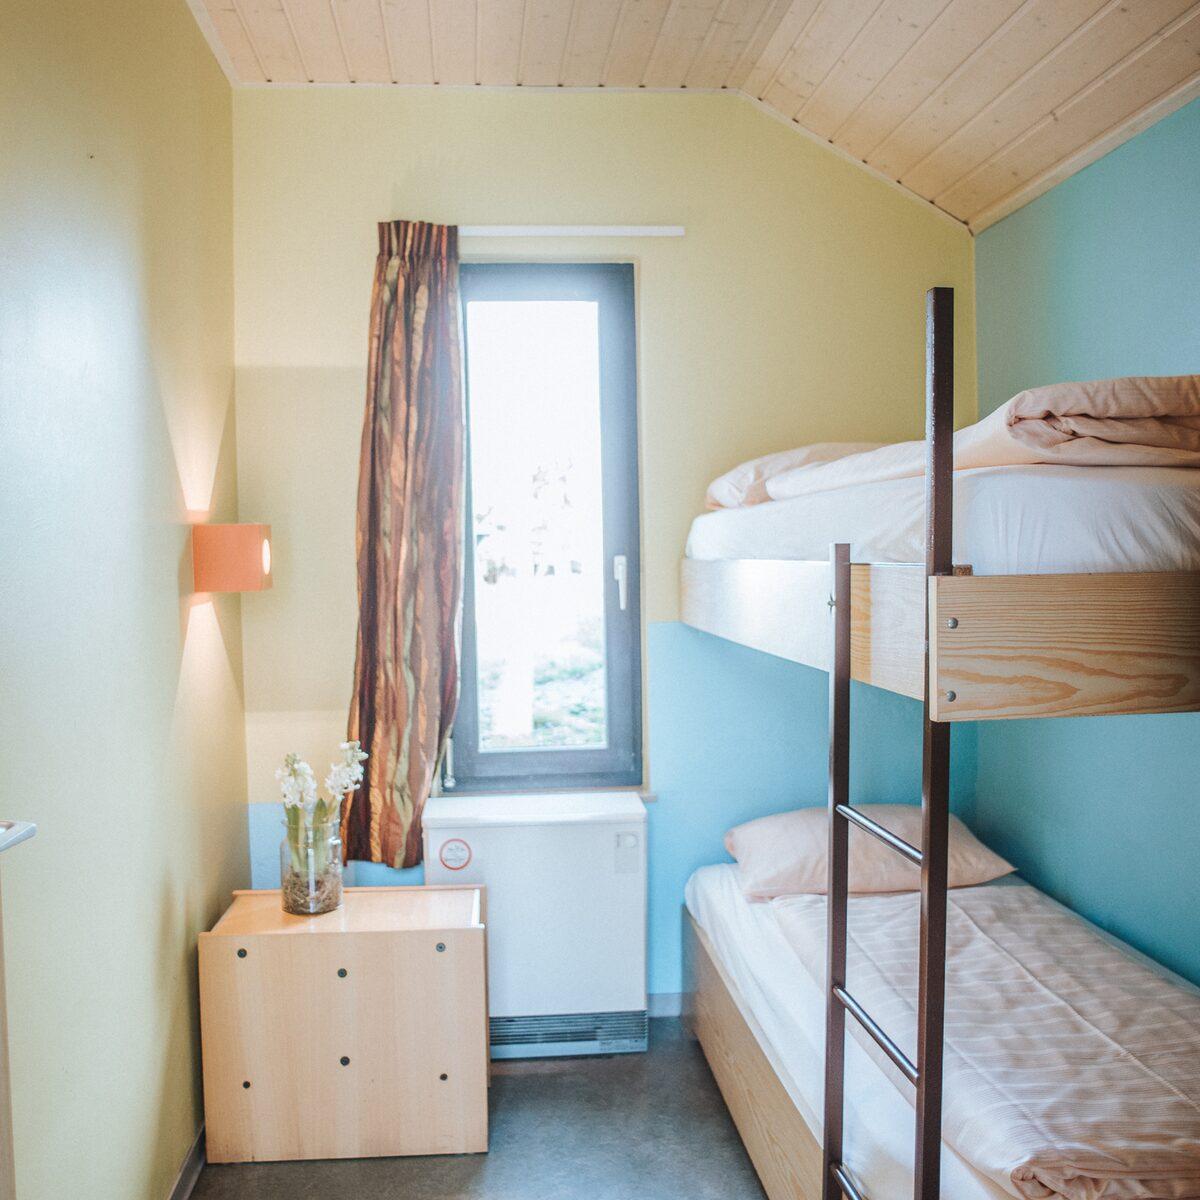 Standard Ferienhaus 6P